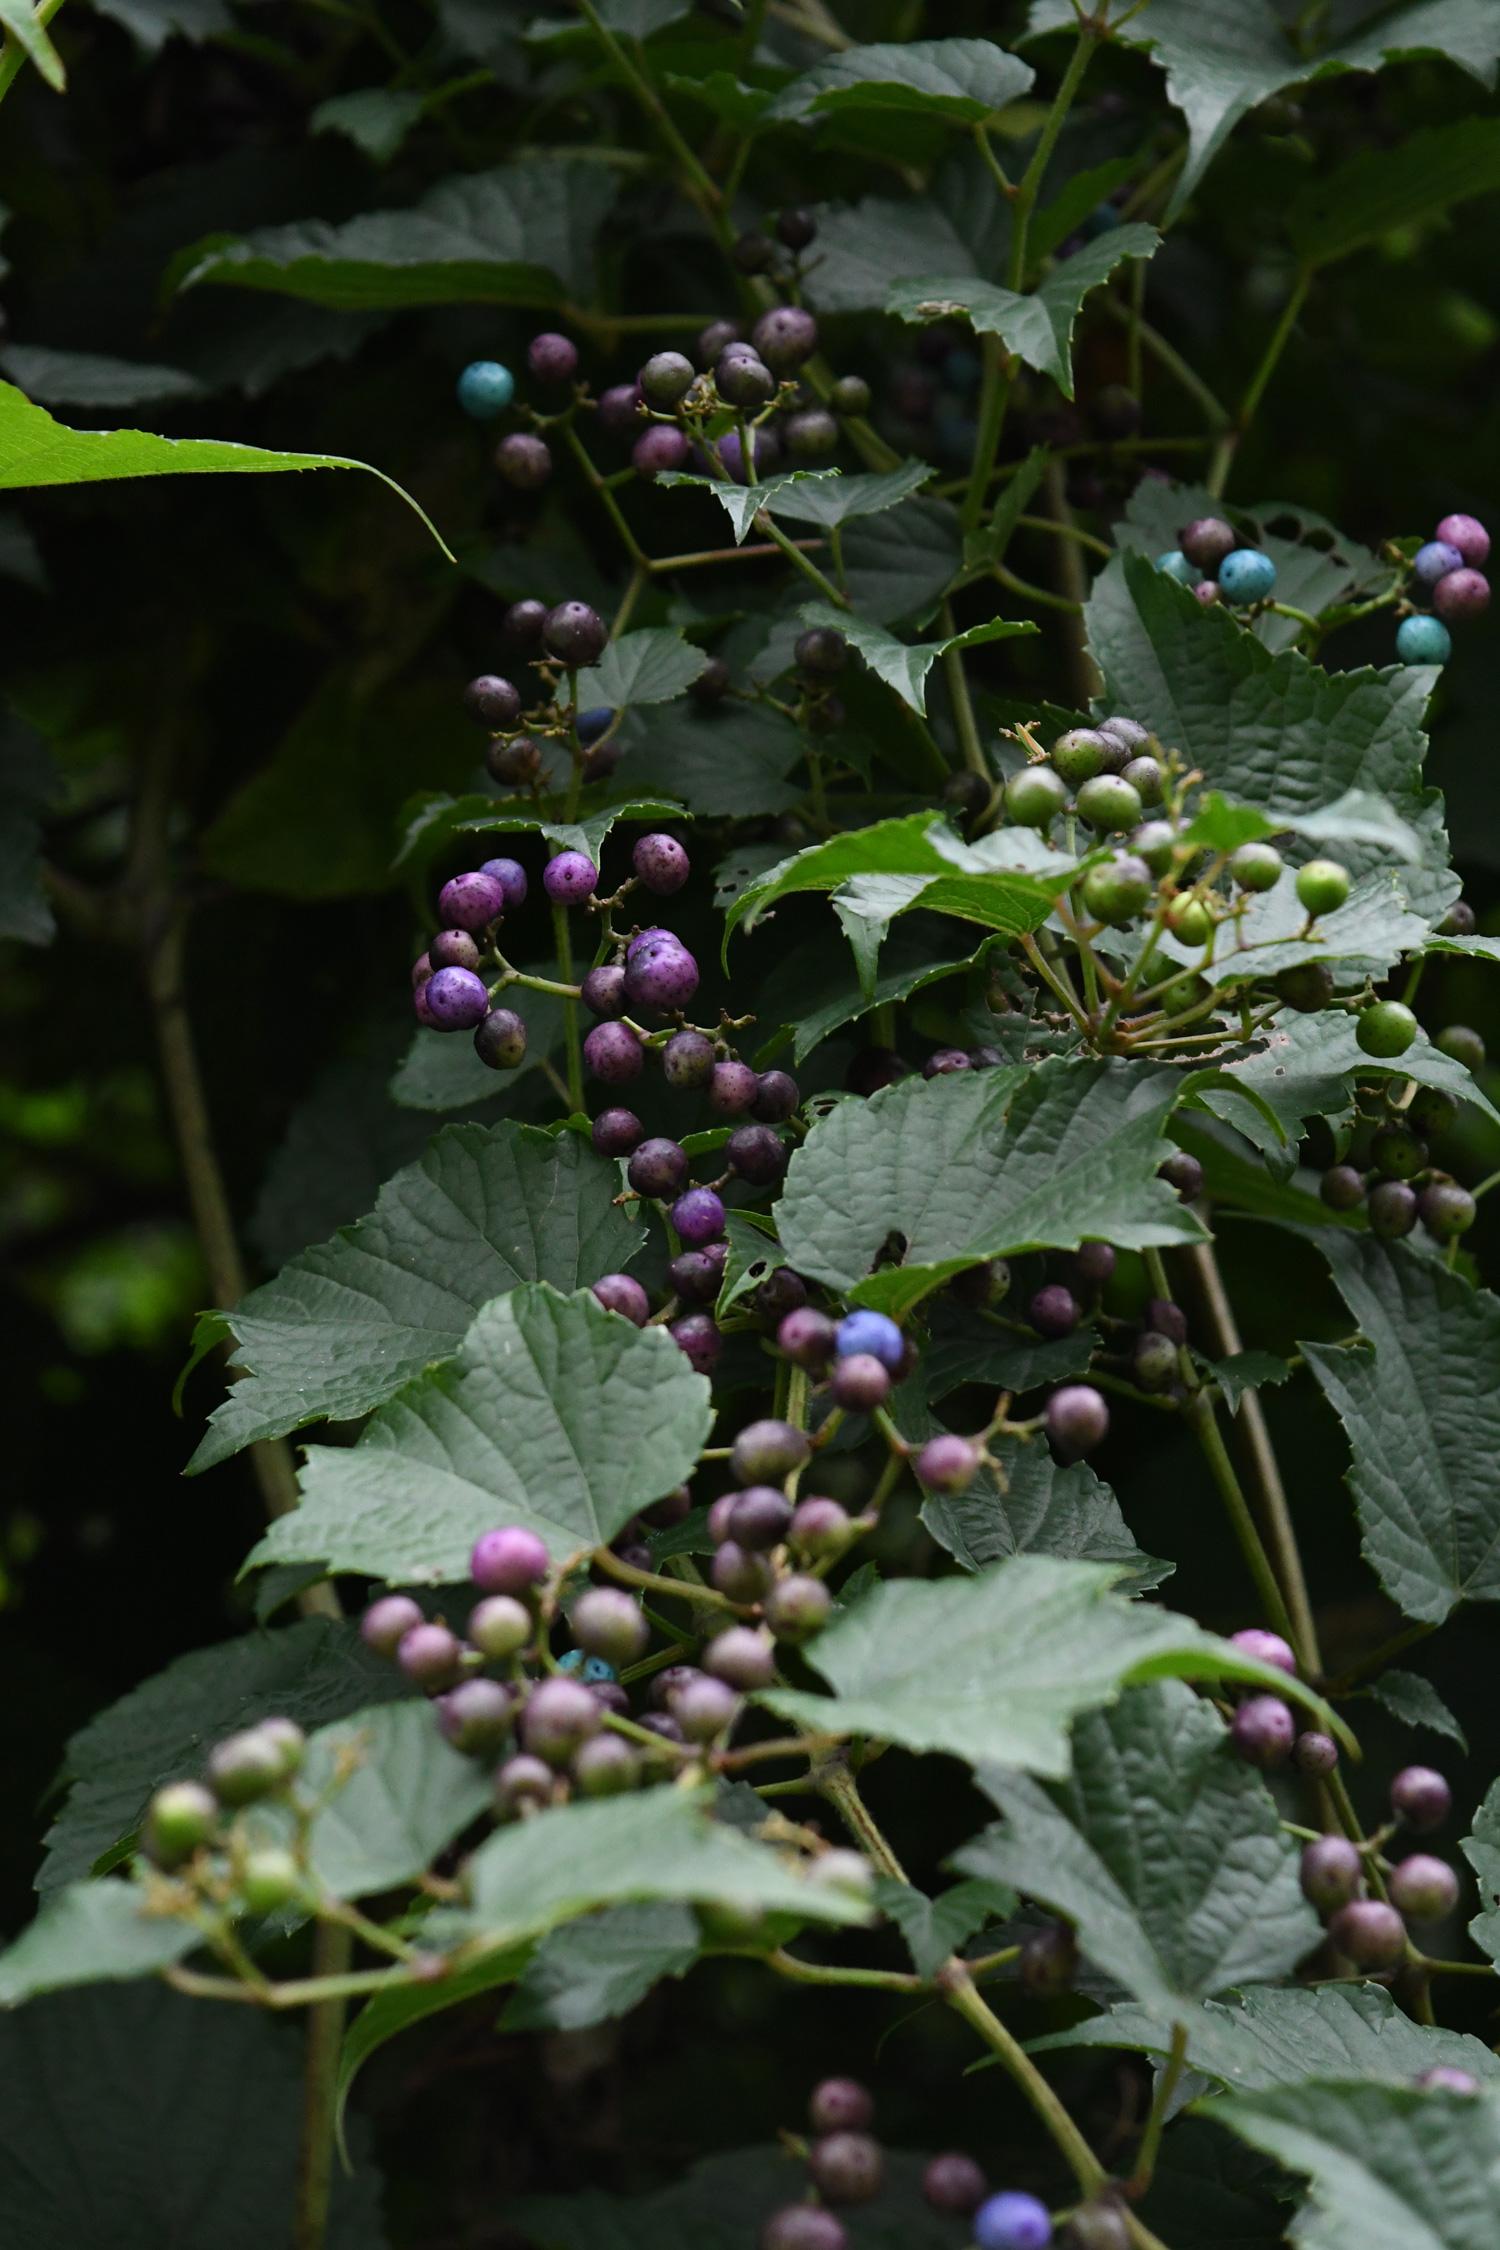 Porcelain vine berries, Prospect Park